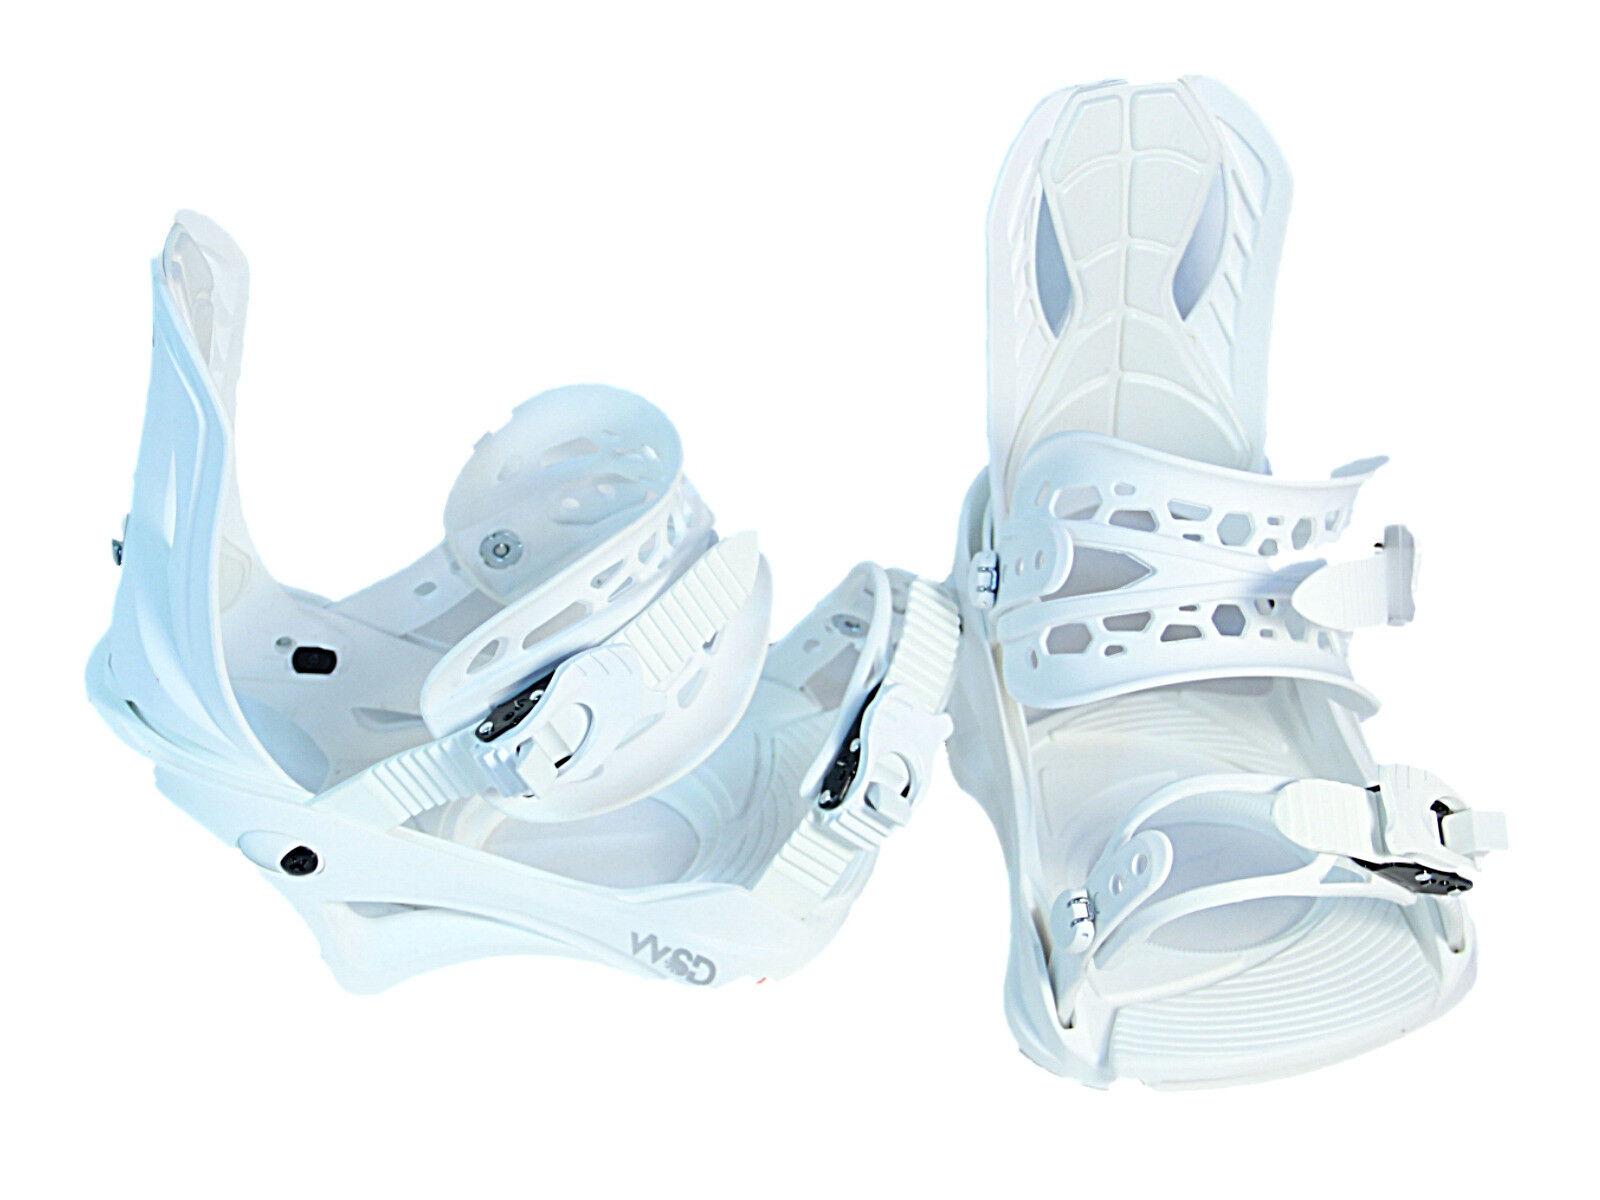 Snowboard bindings Pro women's 7-11US sizes White 2019 model no box New